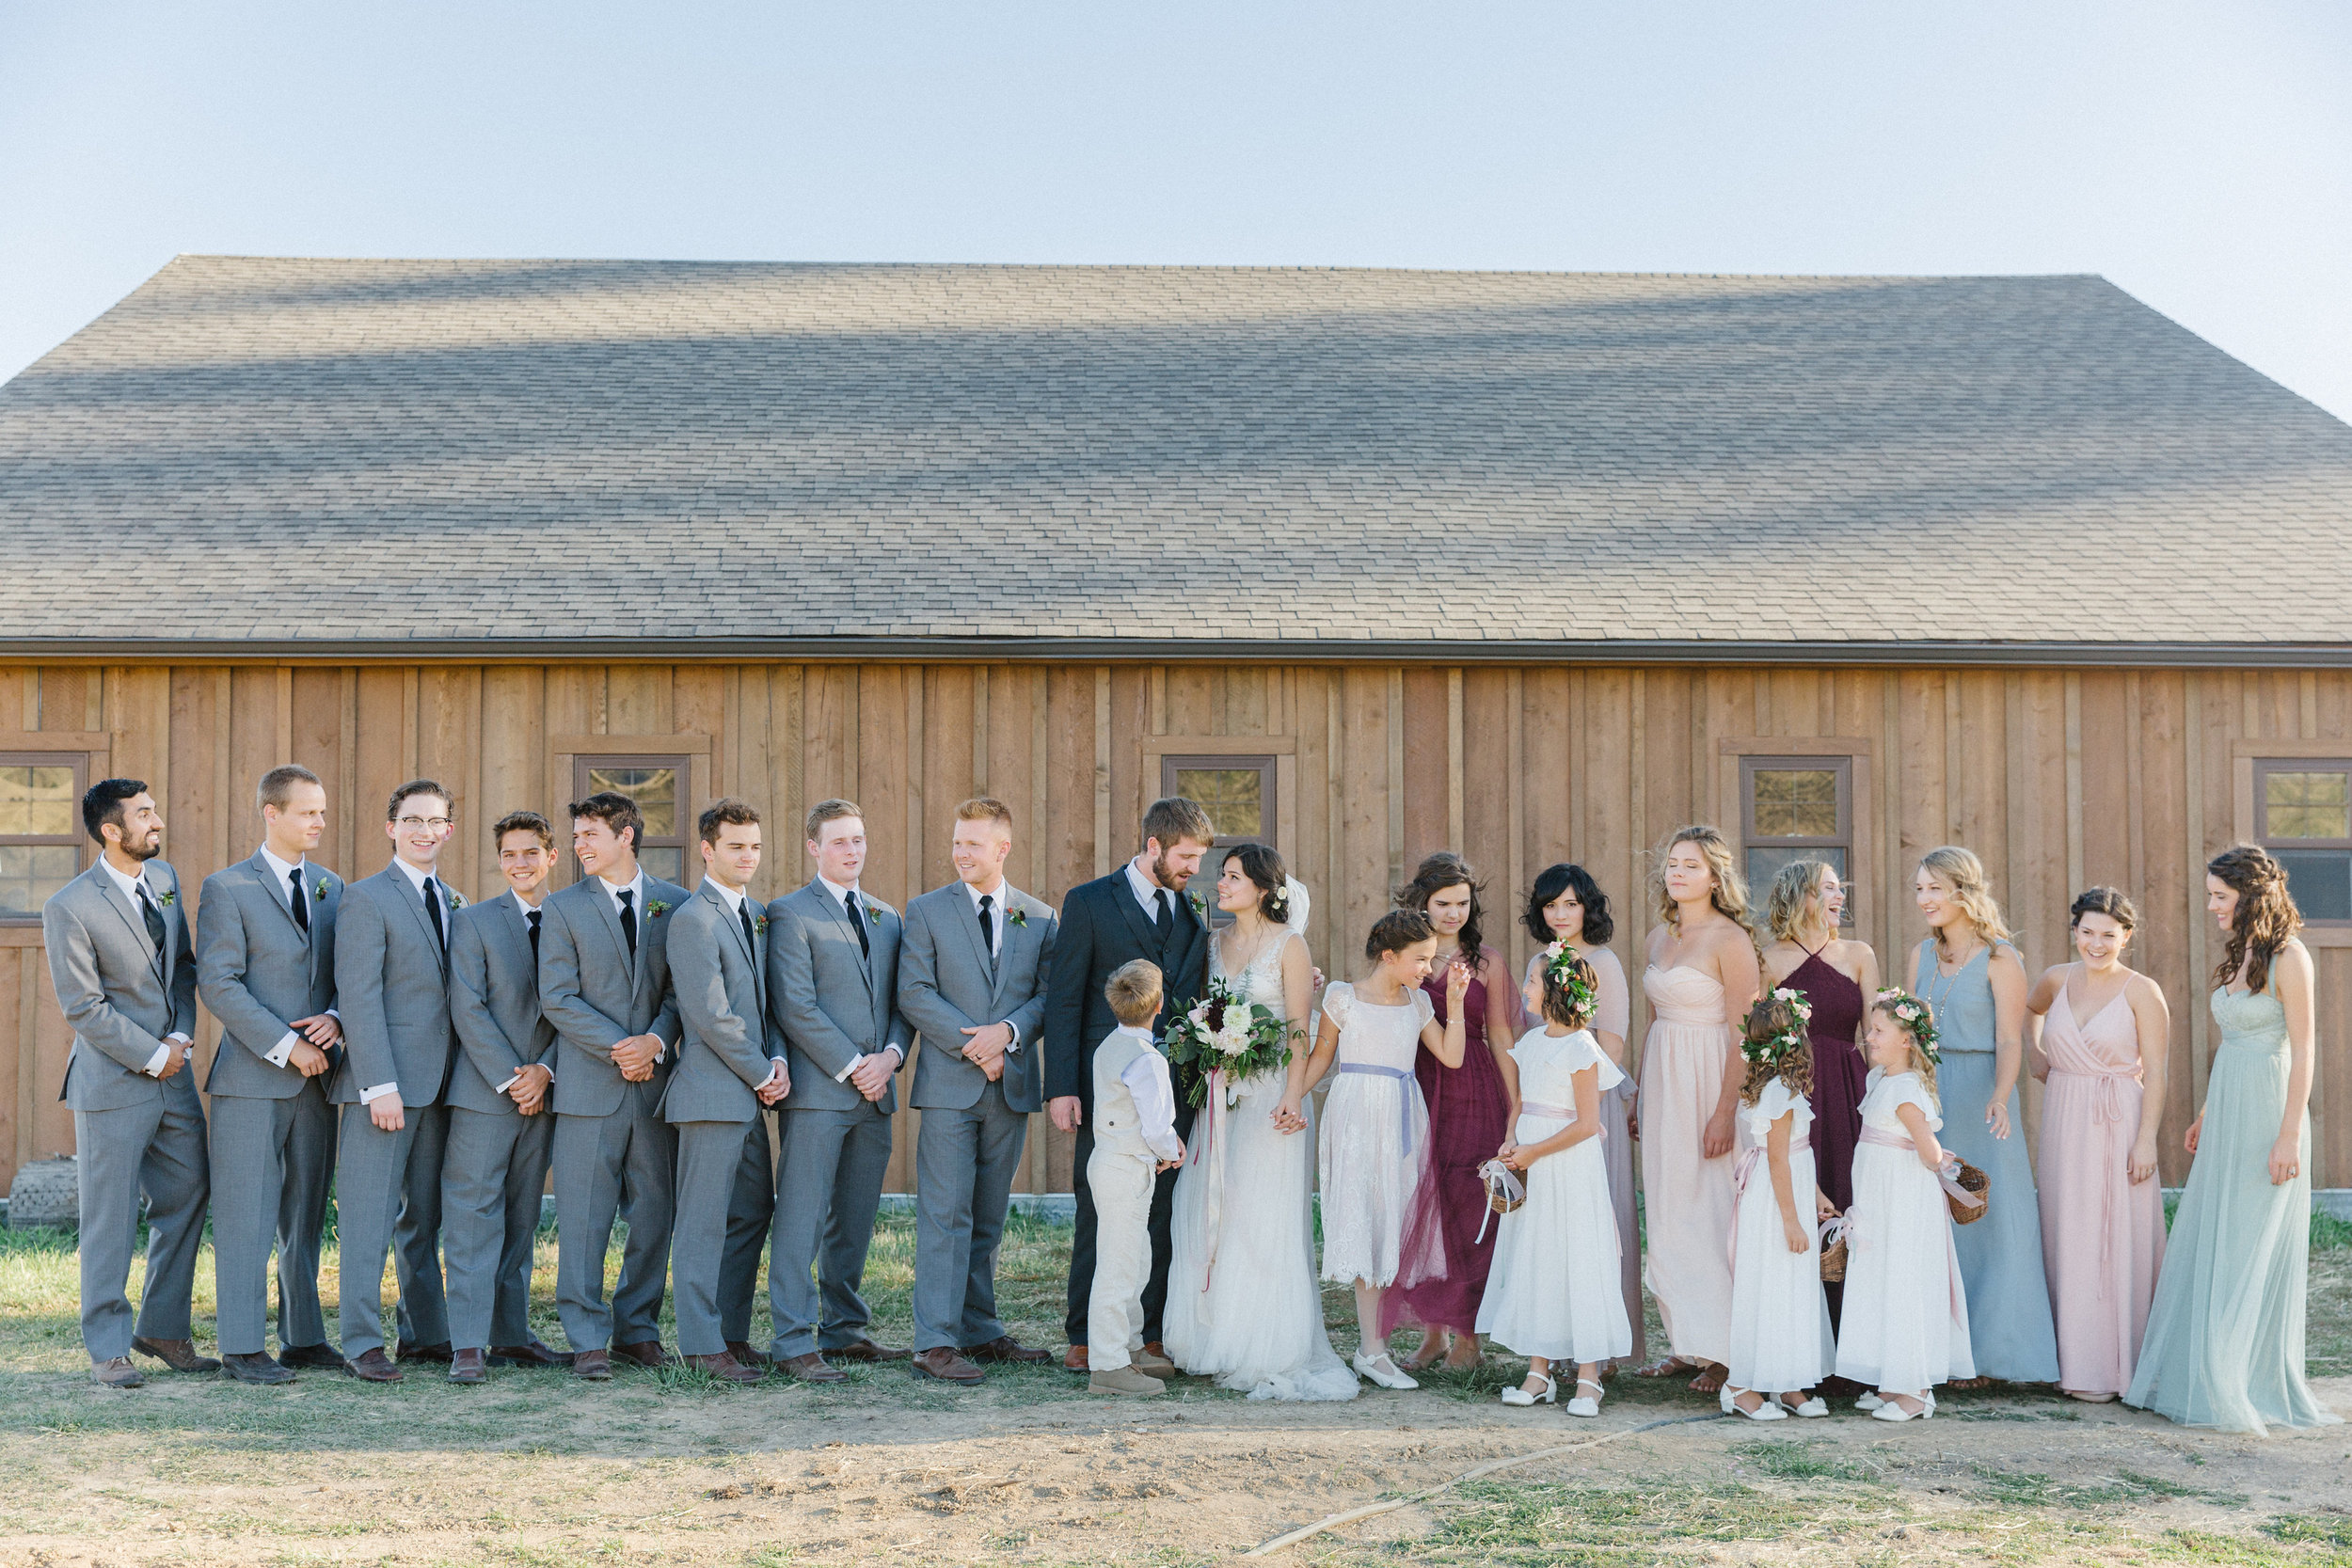 Idaho-Field-Forest-Wedding-Film-Photographer-Kristina-Adams-635.jpg